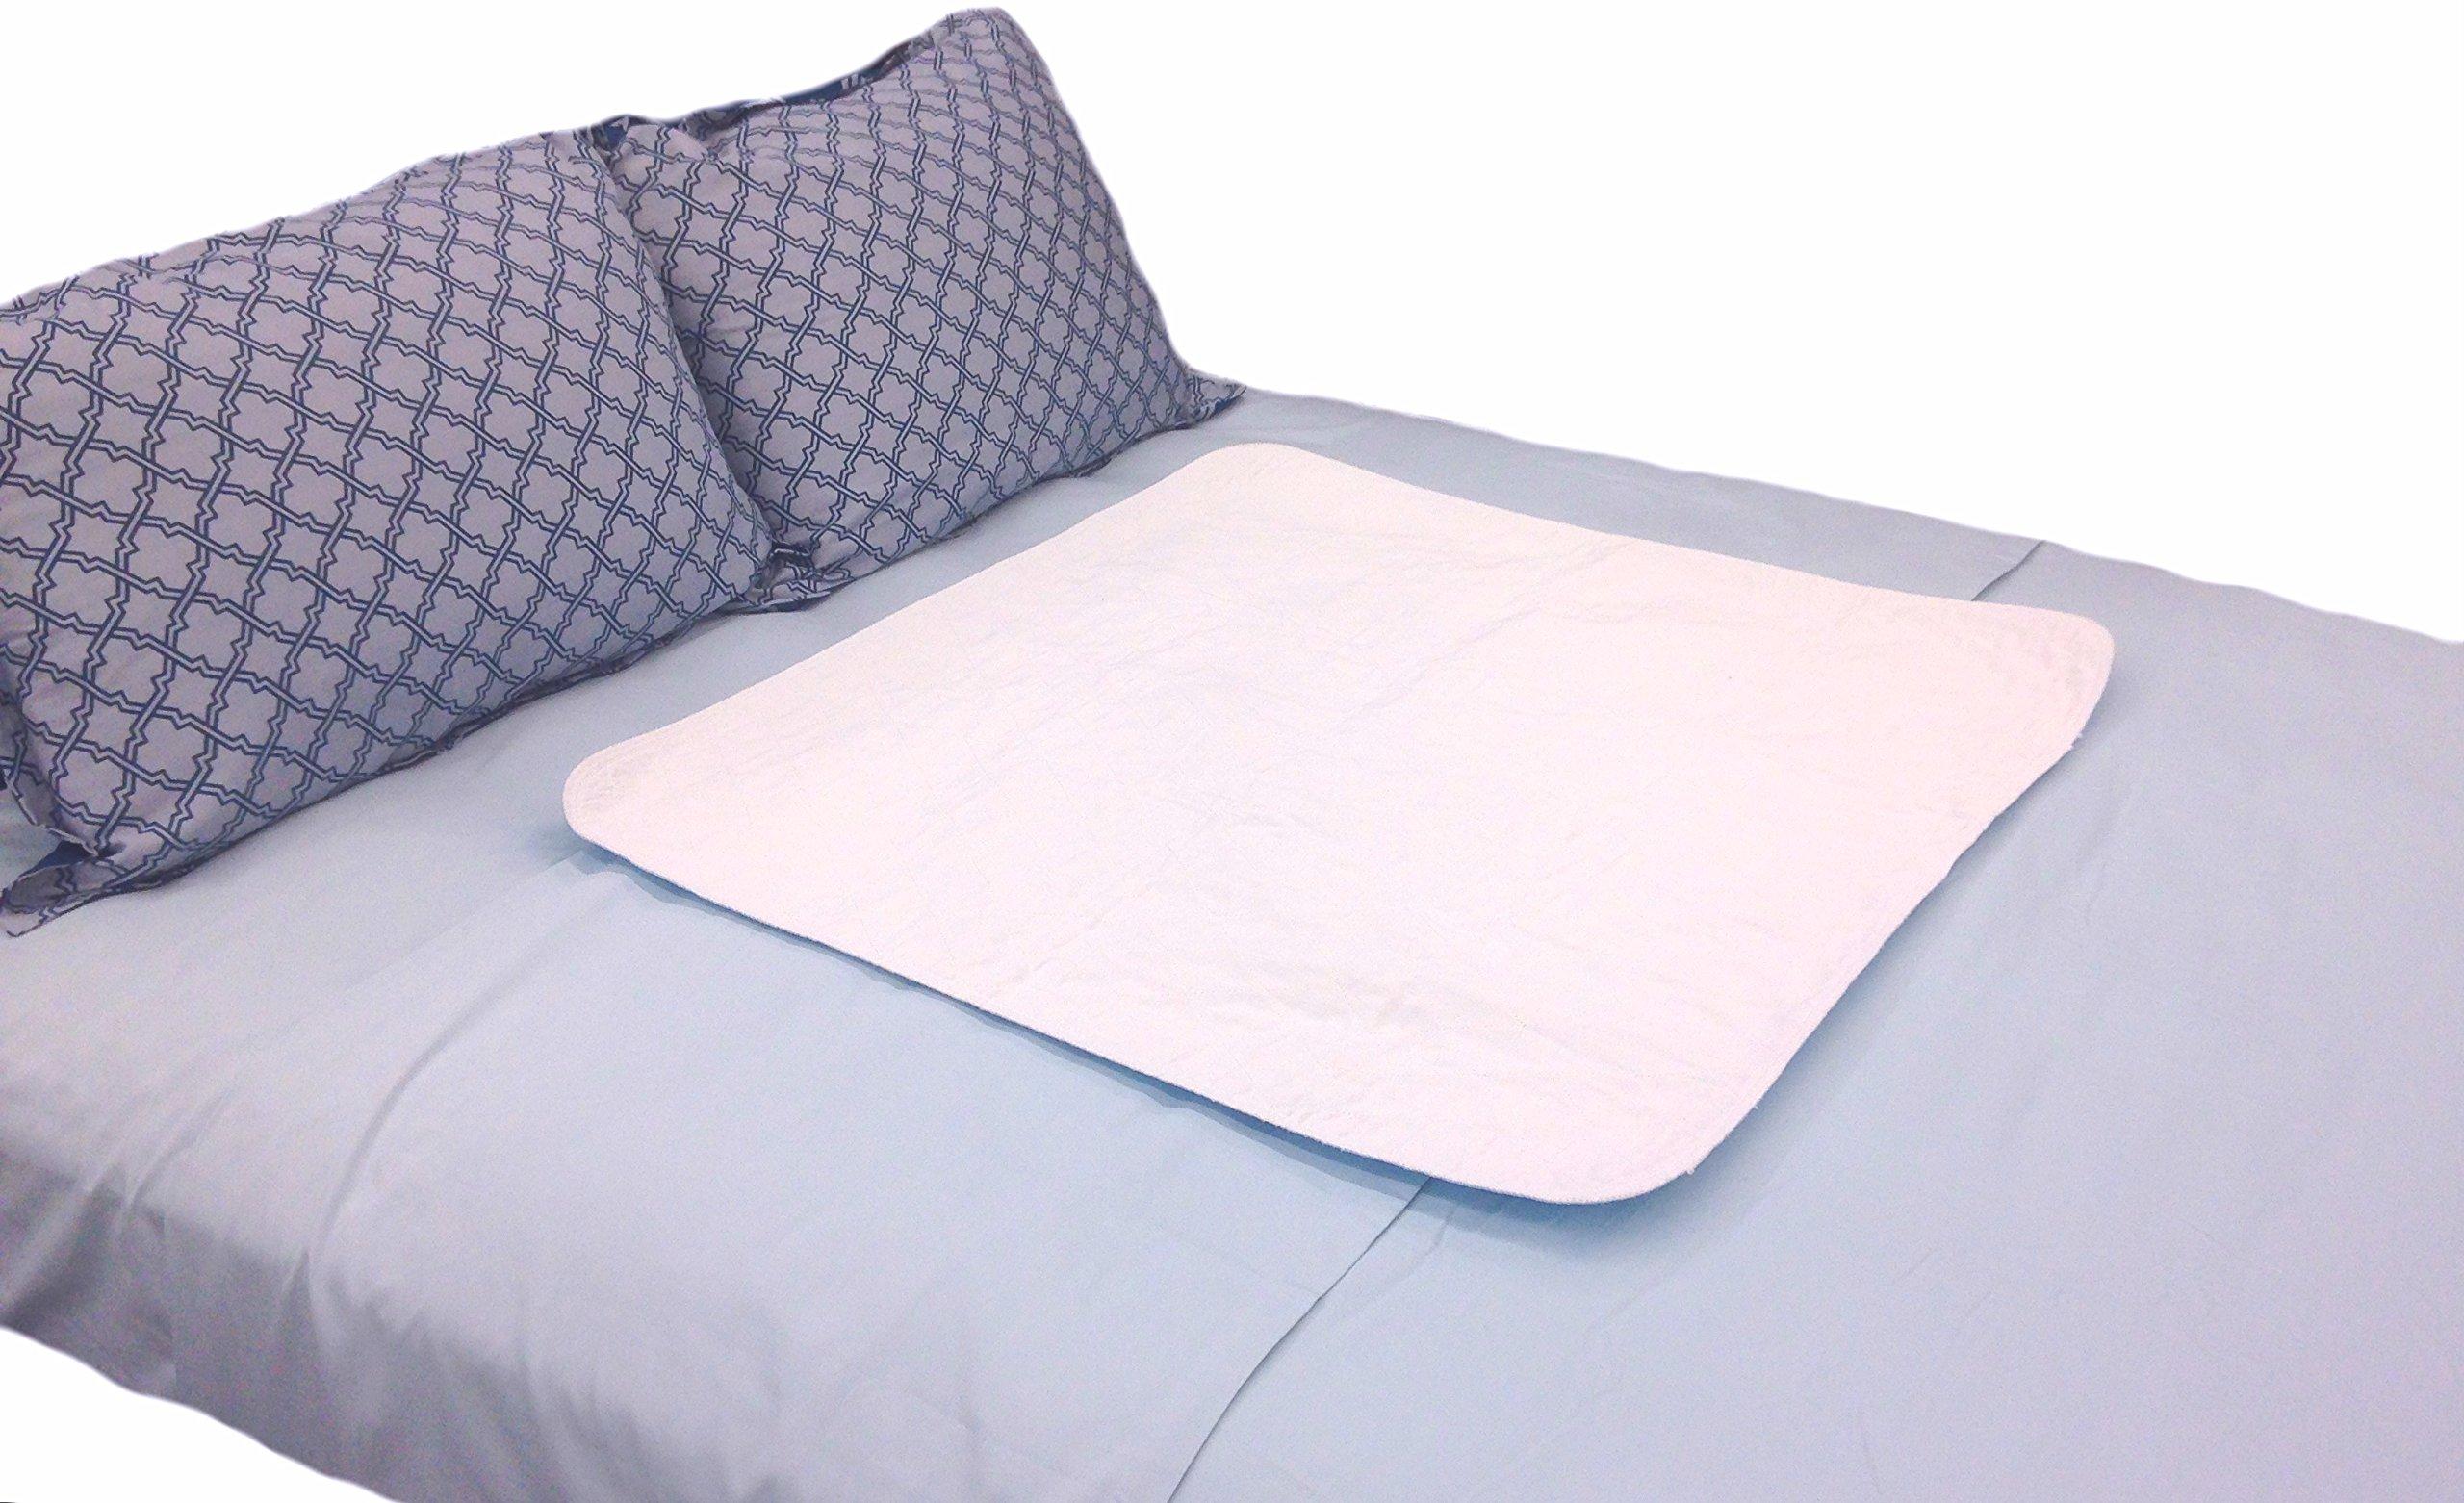 Amazon.com: Large Premium Absorbent Waterproof Bed Pad